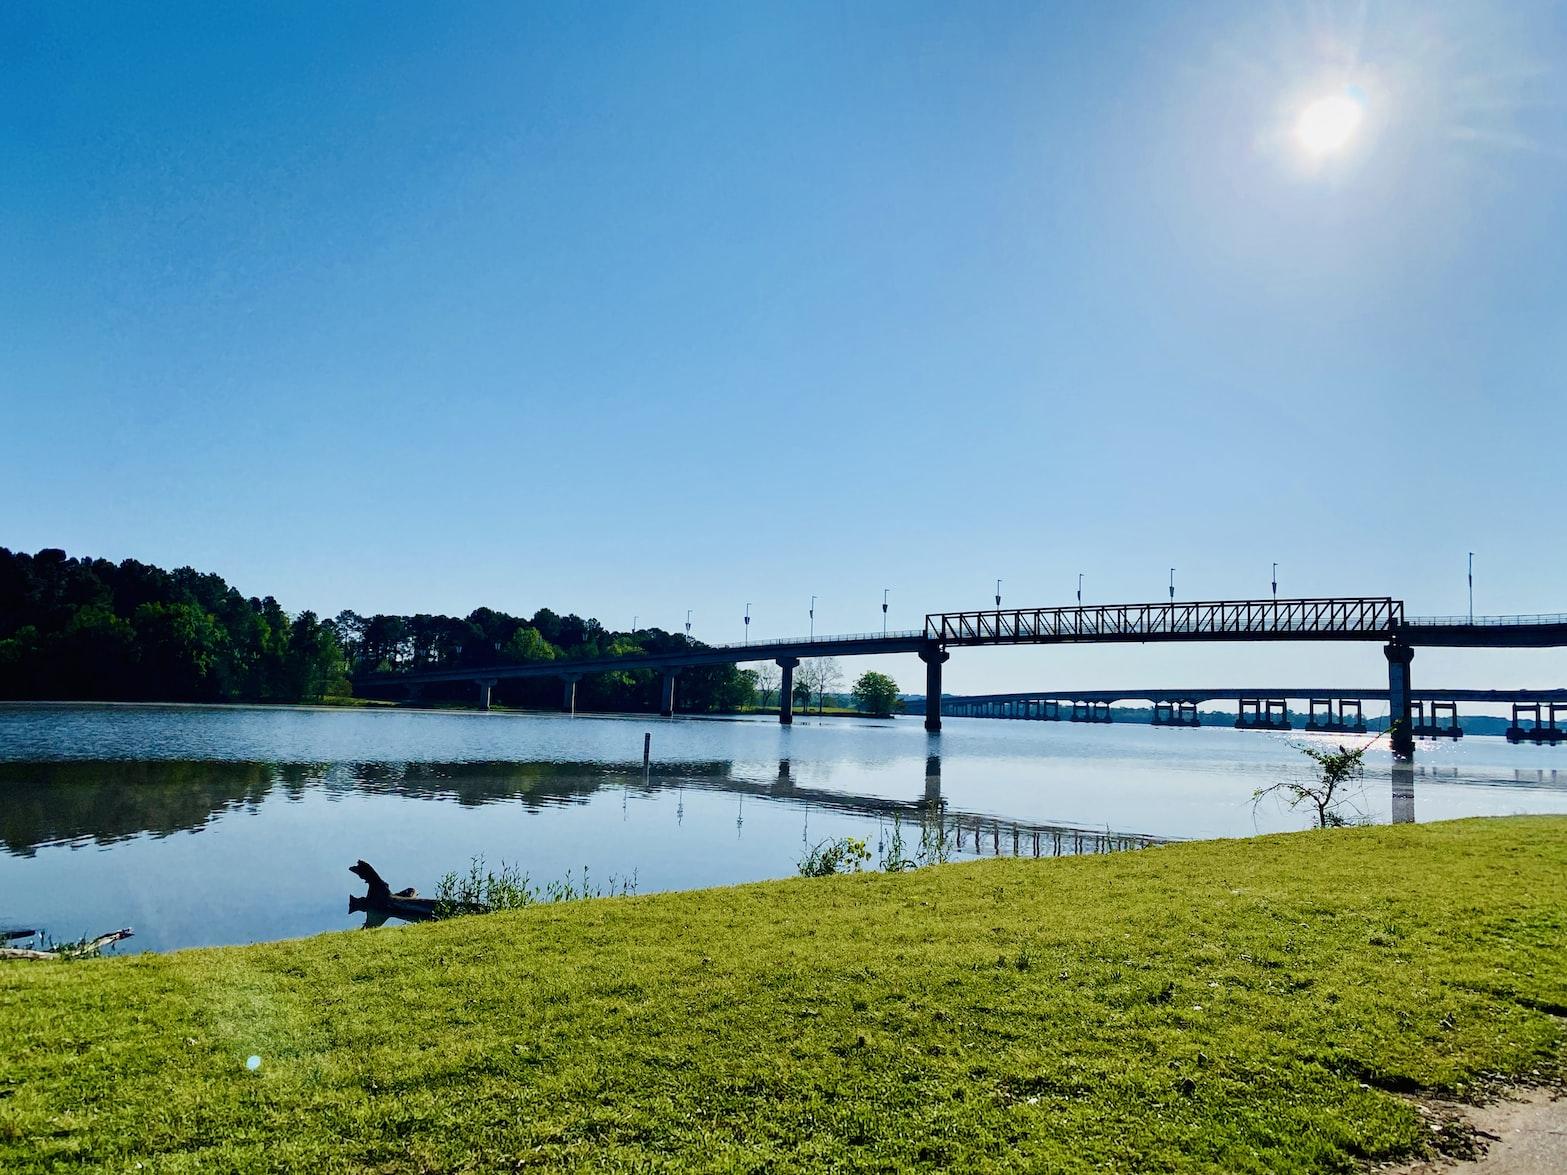 bridge and river in Little Rock, Arkansas